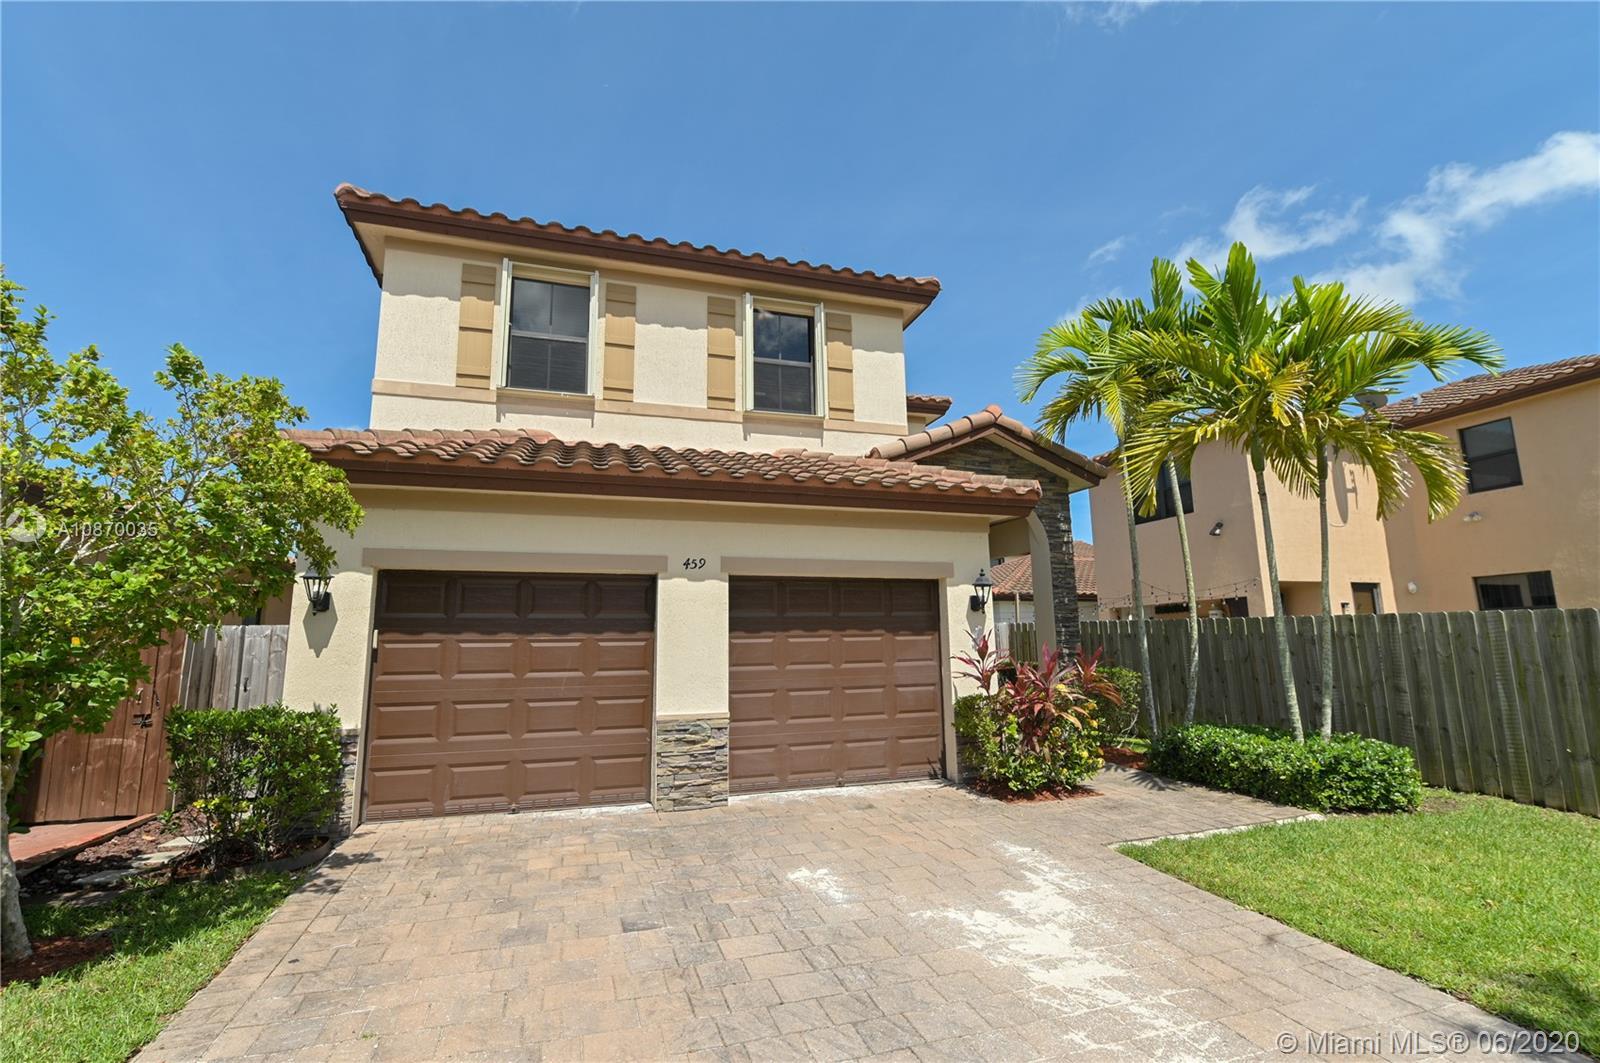 459 SE 33rd Ter Property Photo - Homestead, FL real estate listing